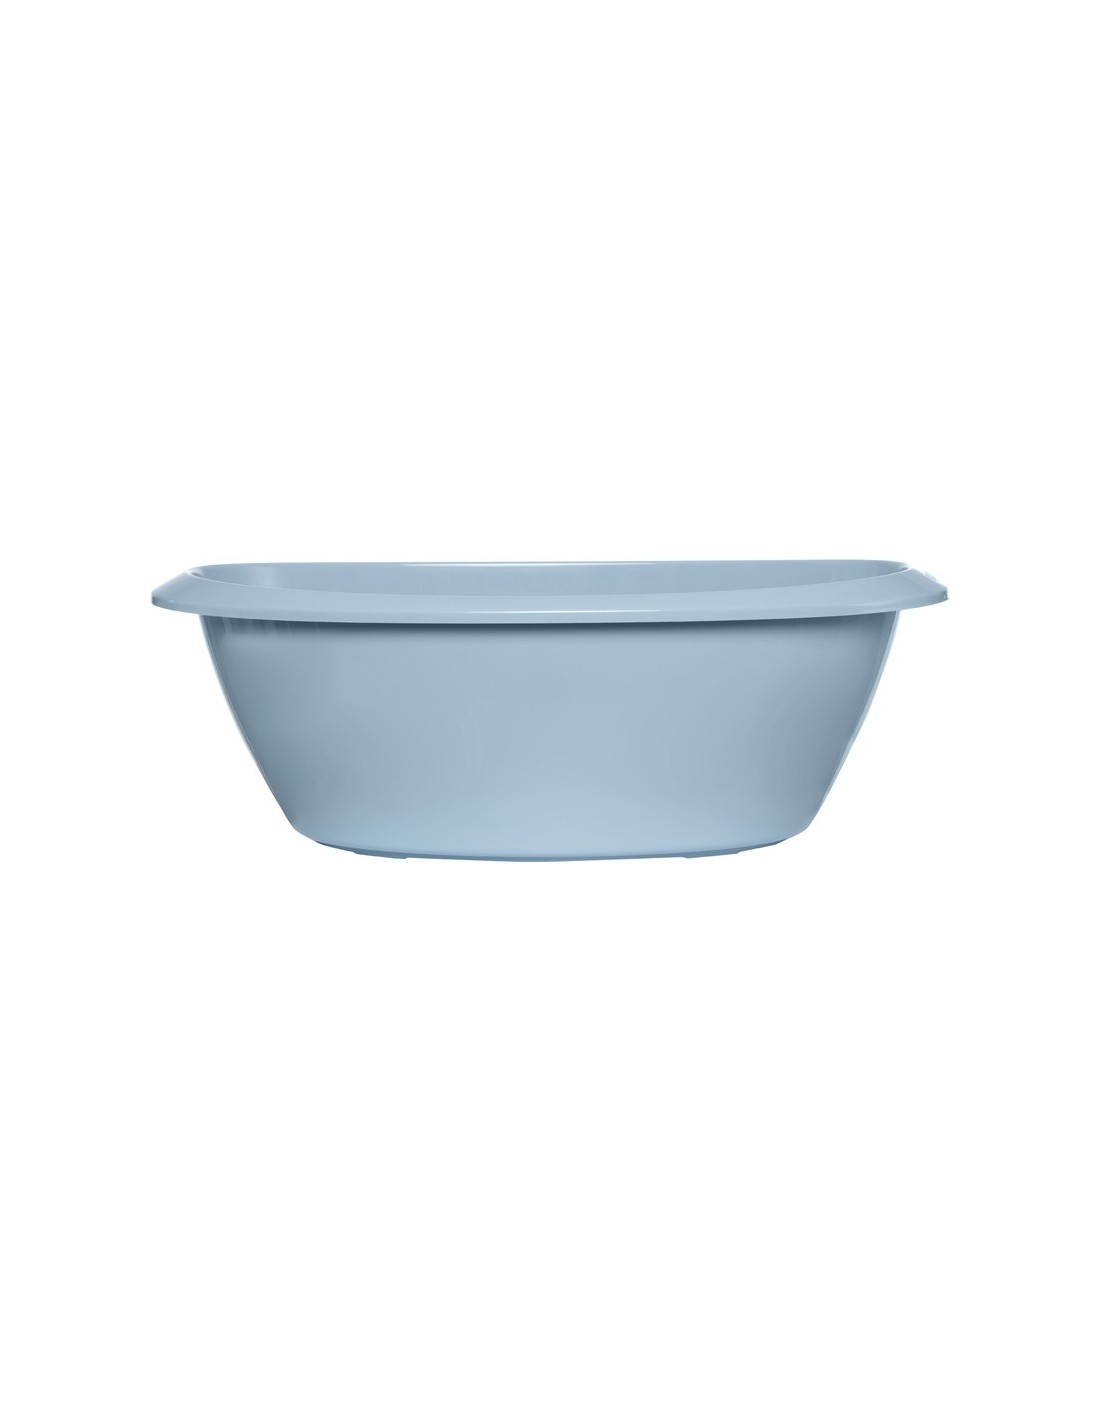 Luma Baby Bath In Celestial Blue Alex And Co